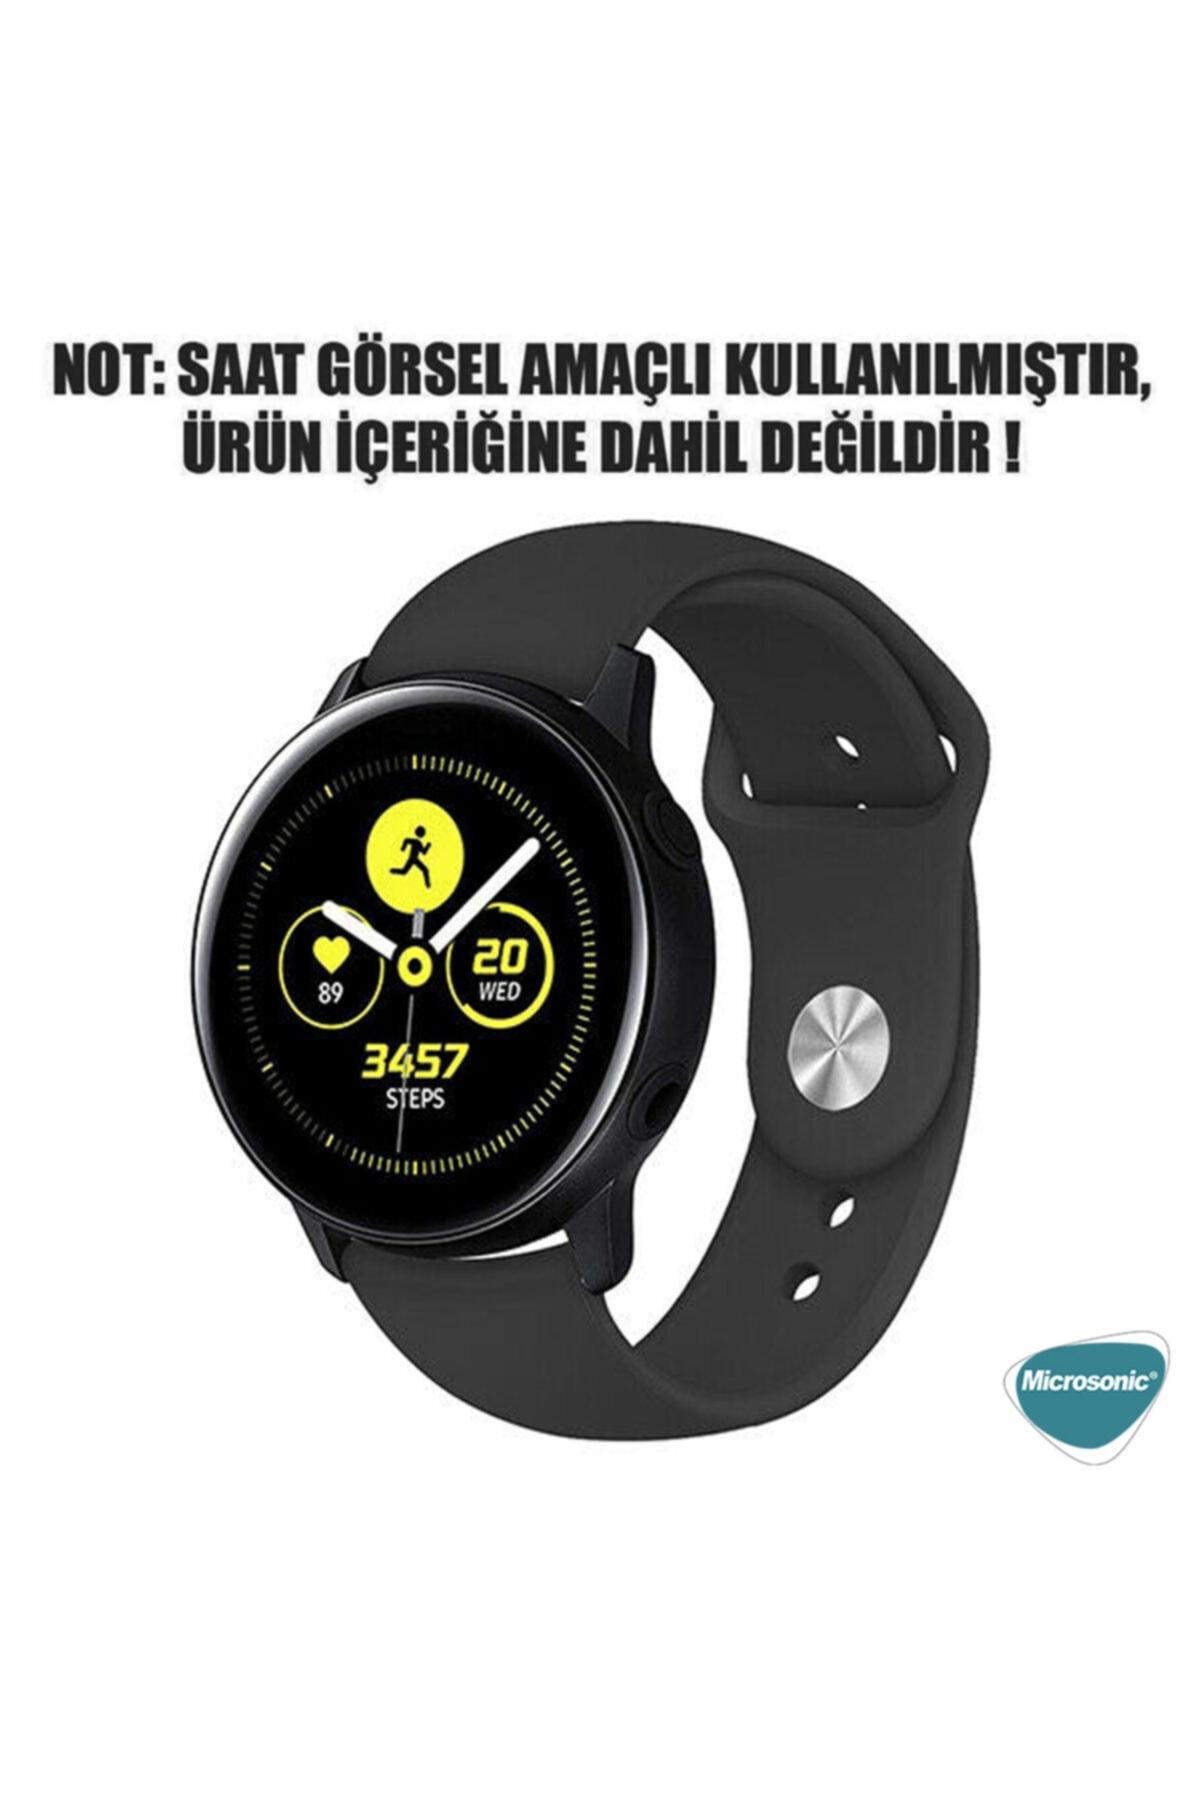 Microsonic Samsung Galaxy Watch Active 2 40 mm Uyumlu Silikon Kordon 2